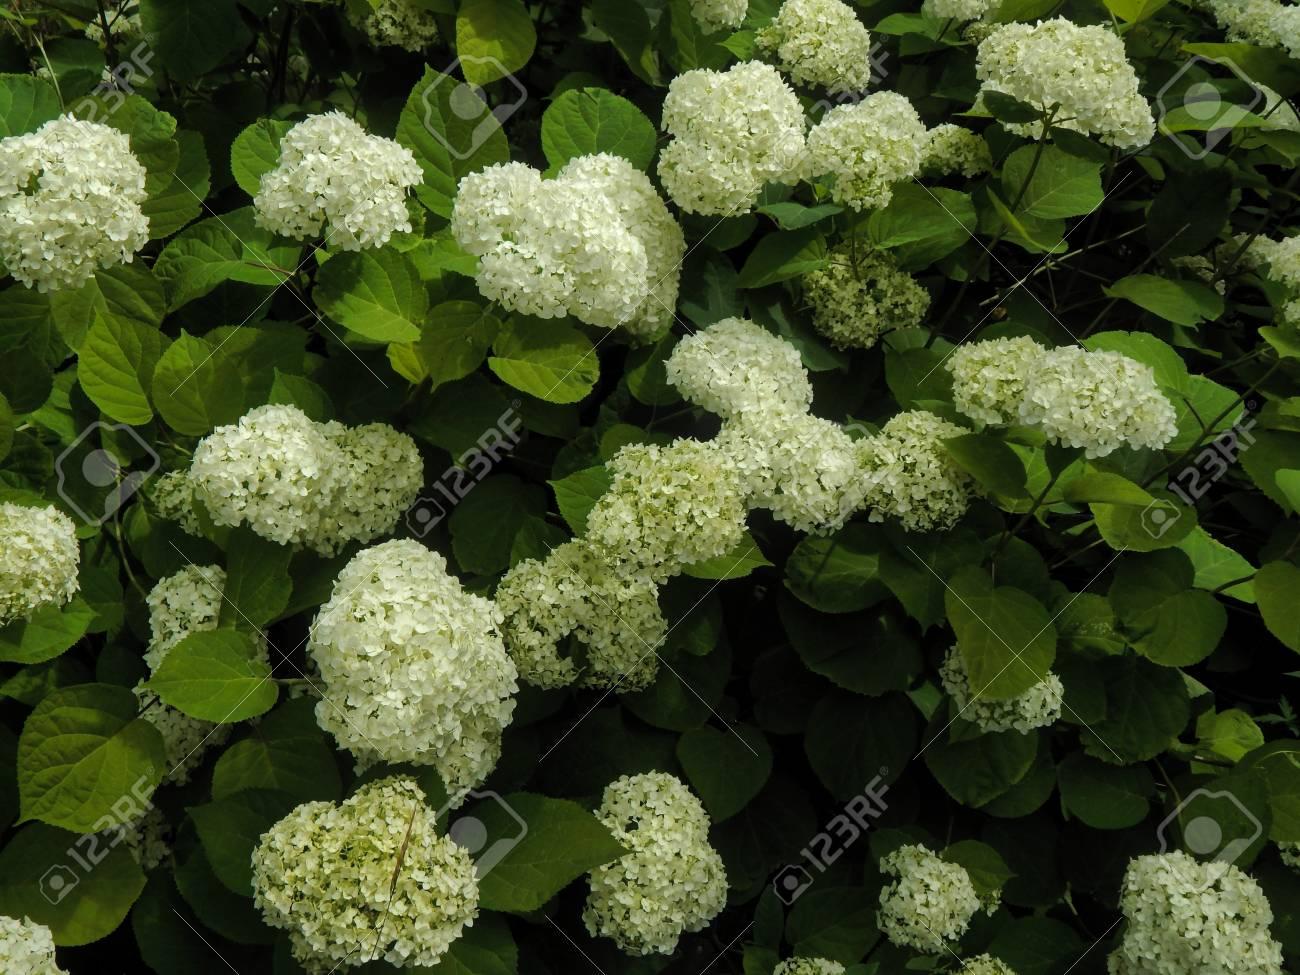 Flowering shrub with white flowers stock photo picture and royalty flowering shrub with white flowers stock photo 59685972 mightylinksfo